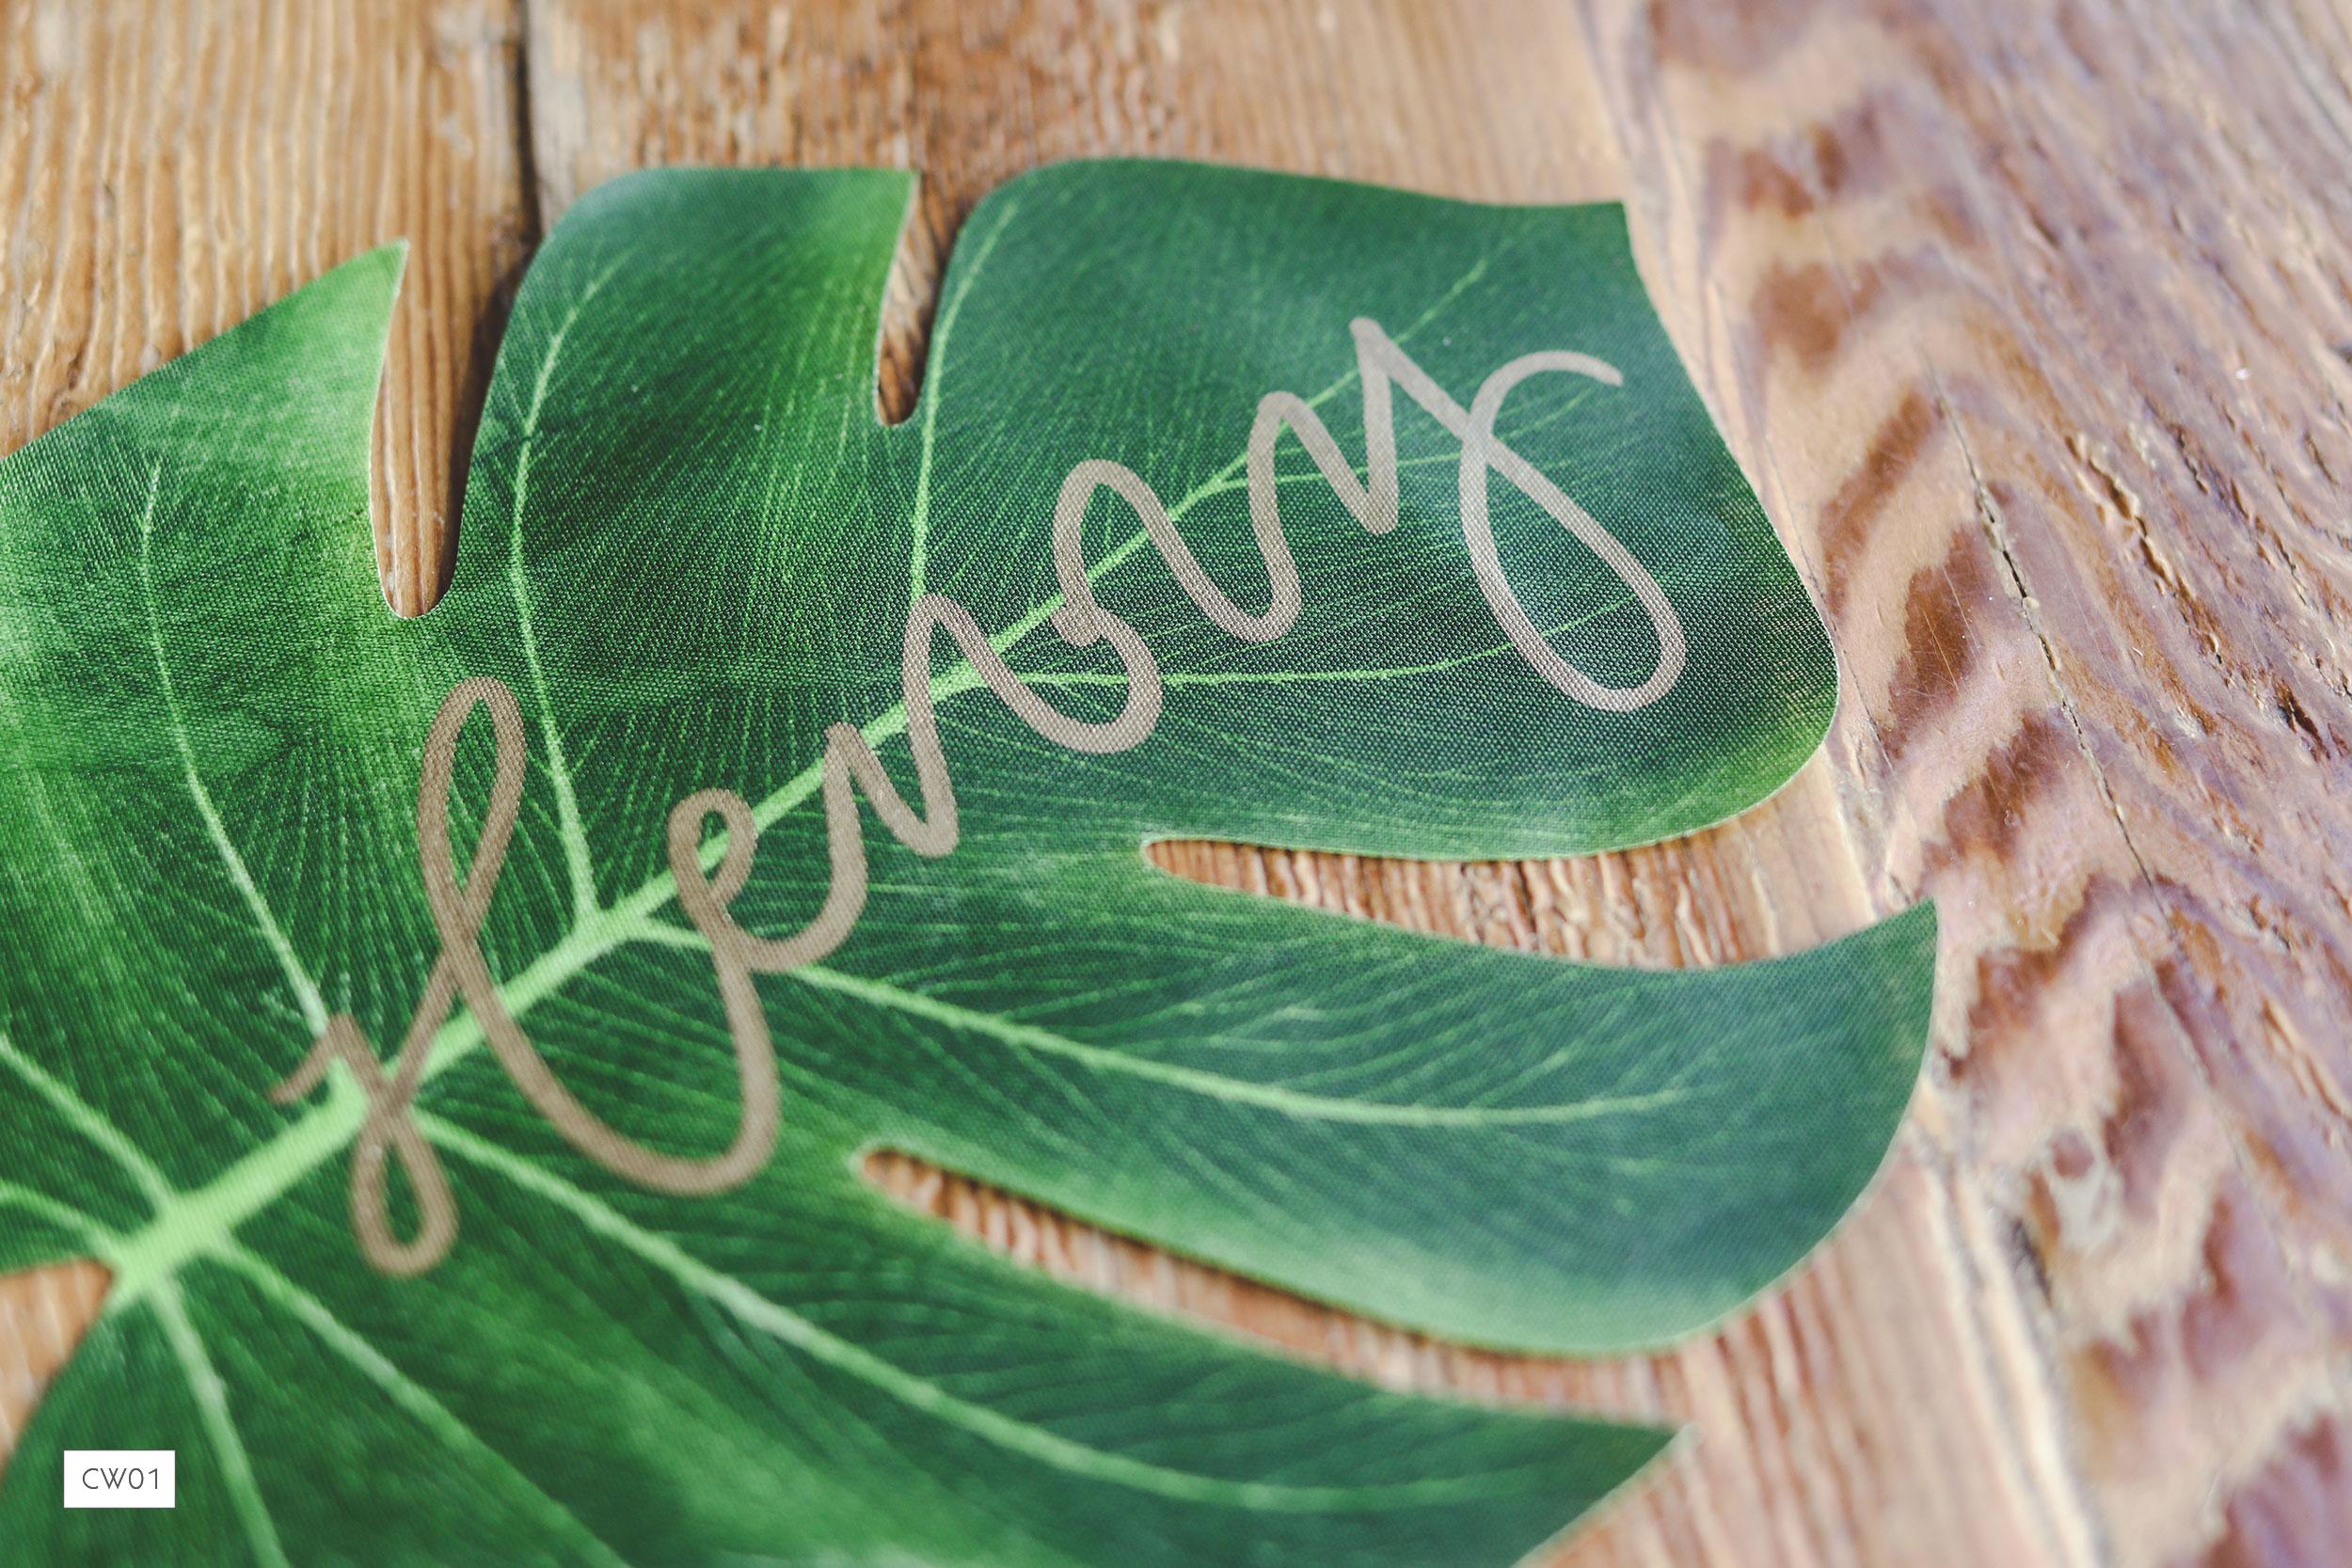 Calligraphy_leaf_ananyacards.com.jpg